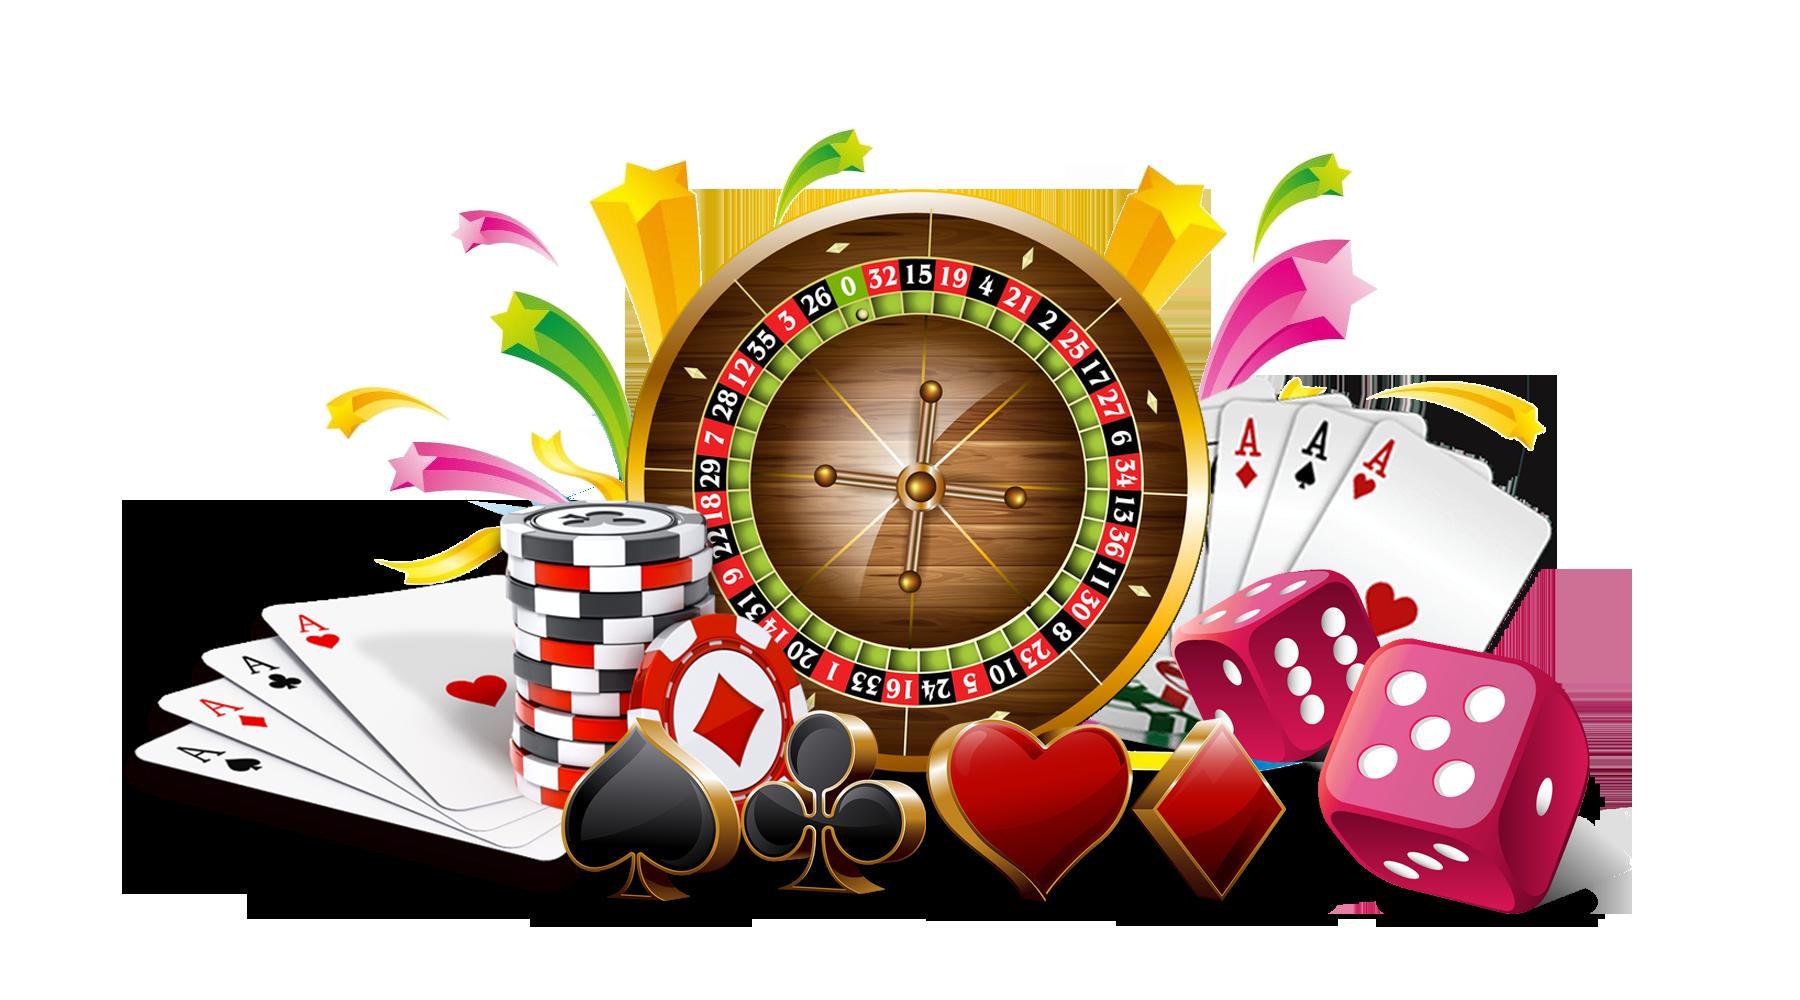 Loto, bingo, pokker, kasiino